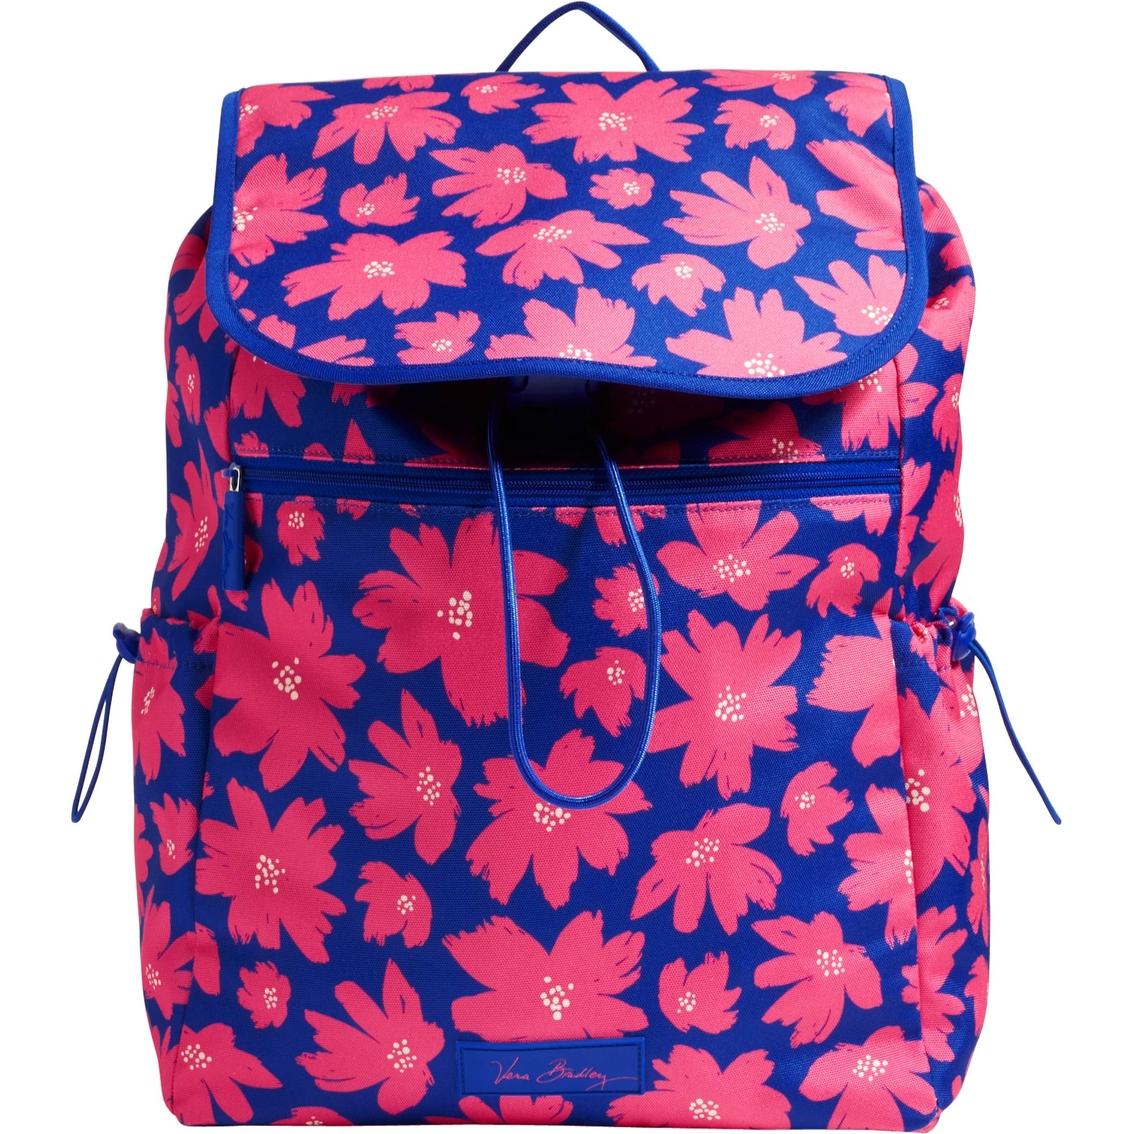 Vera Bradley Lighten Up Drawstring Backpack Art Poppies